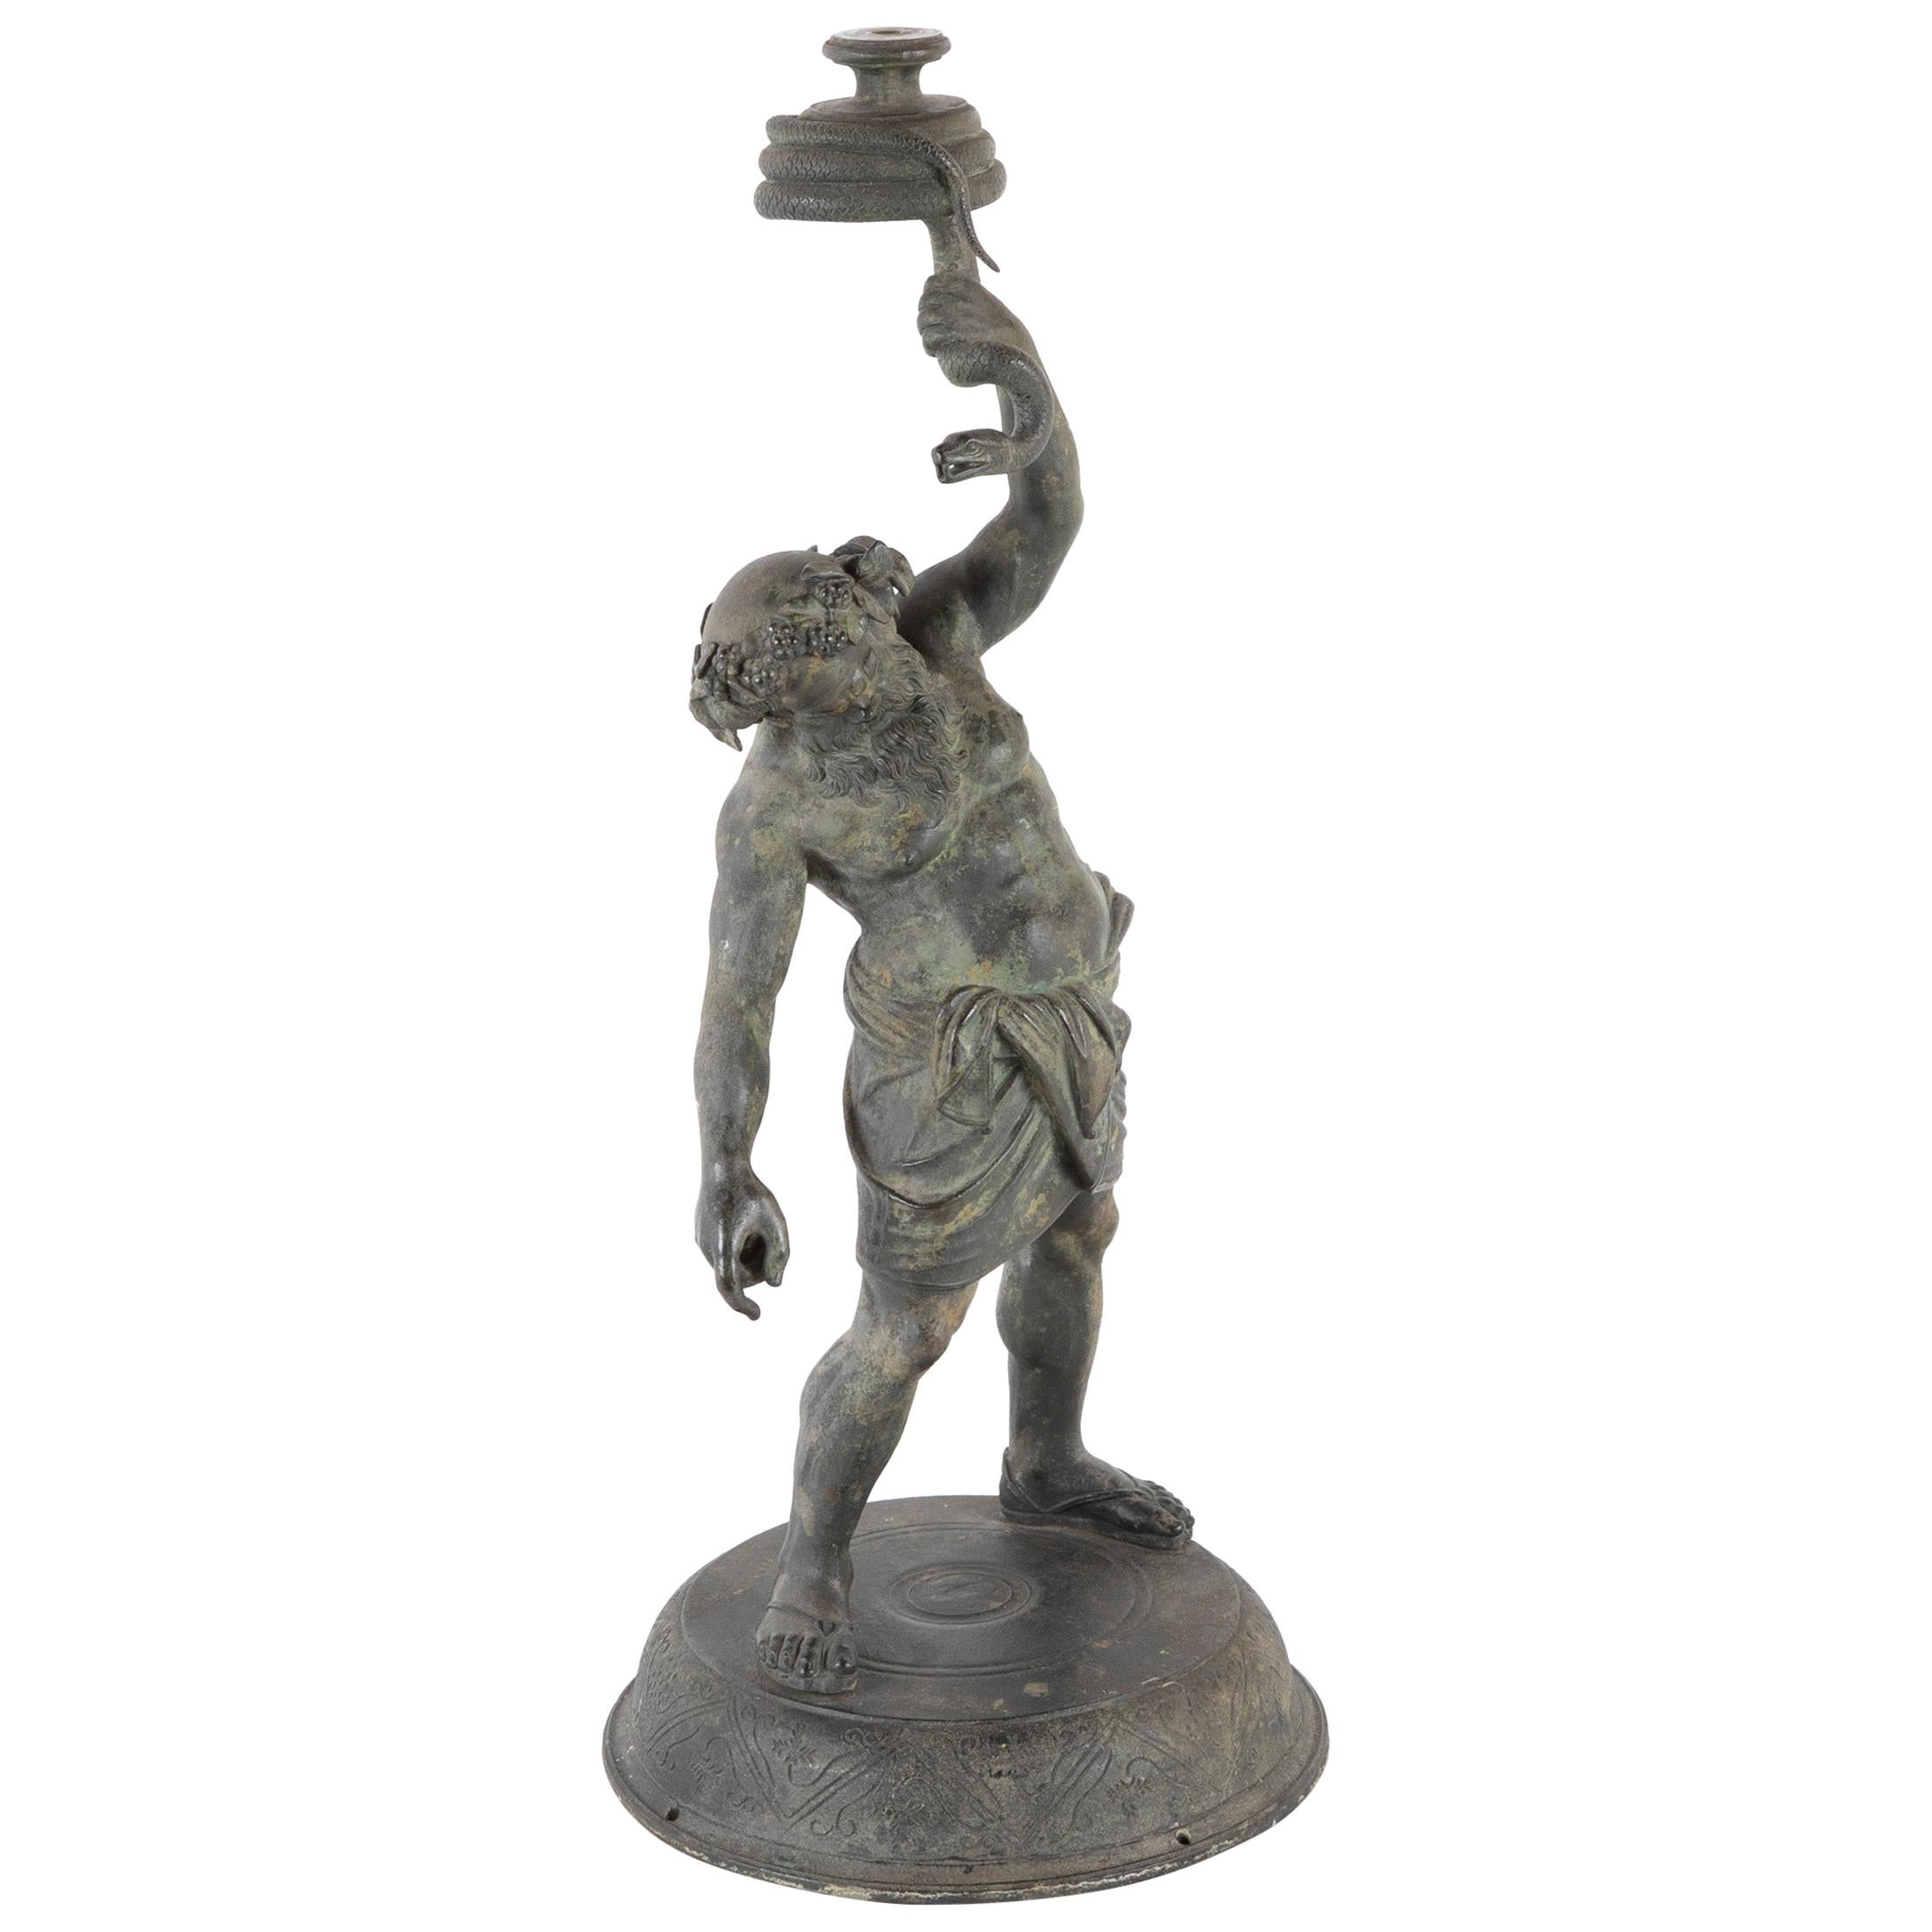 Grand Tour Pompeii Bronze of Silenus, Greek God of Wine